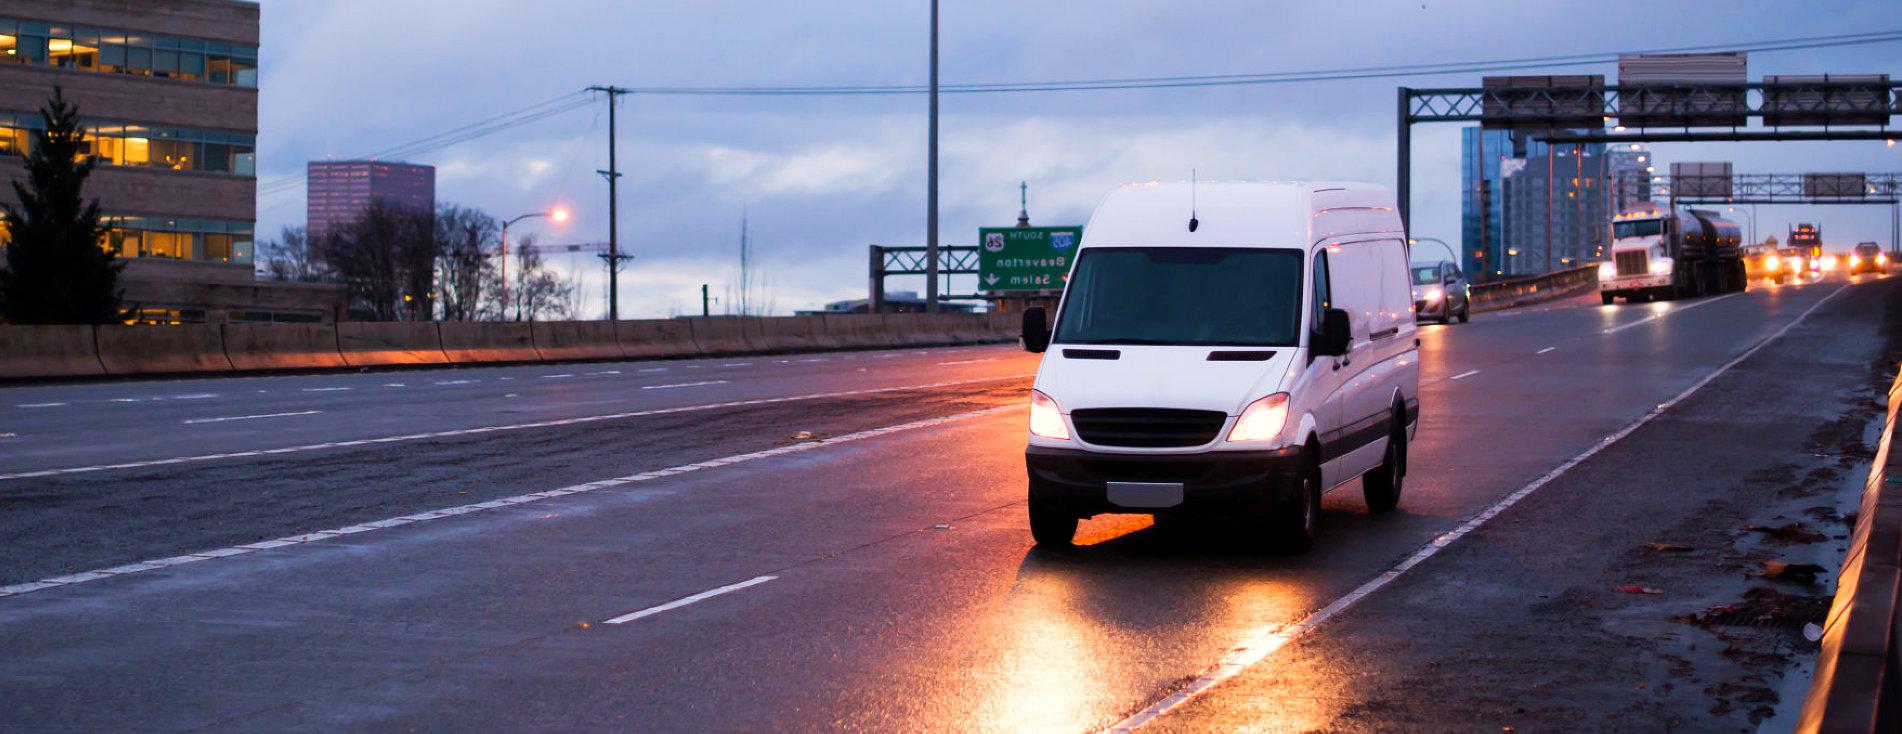 white van running on the road